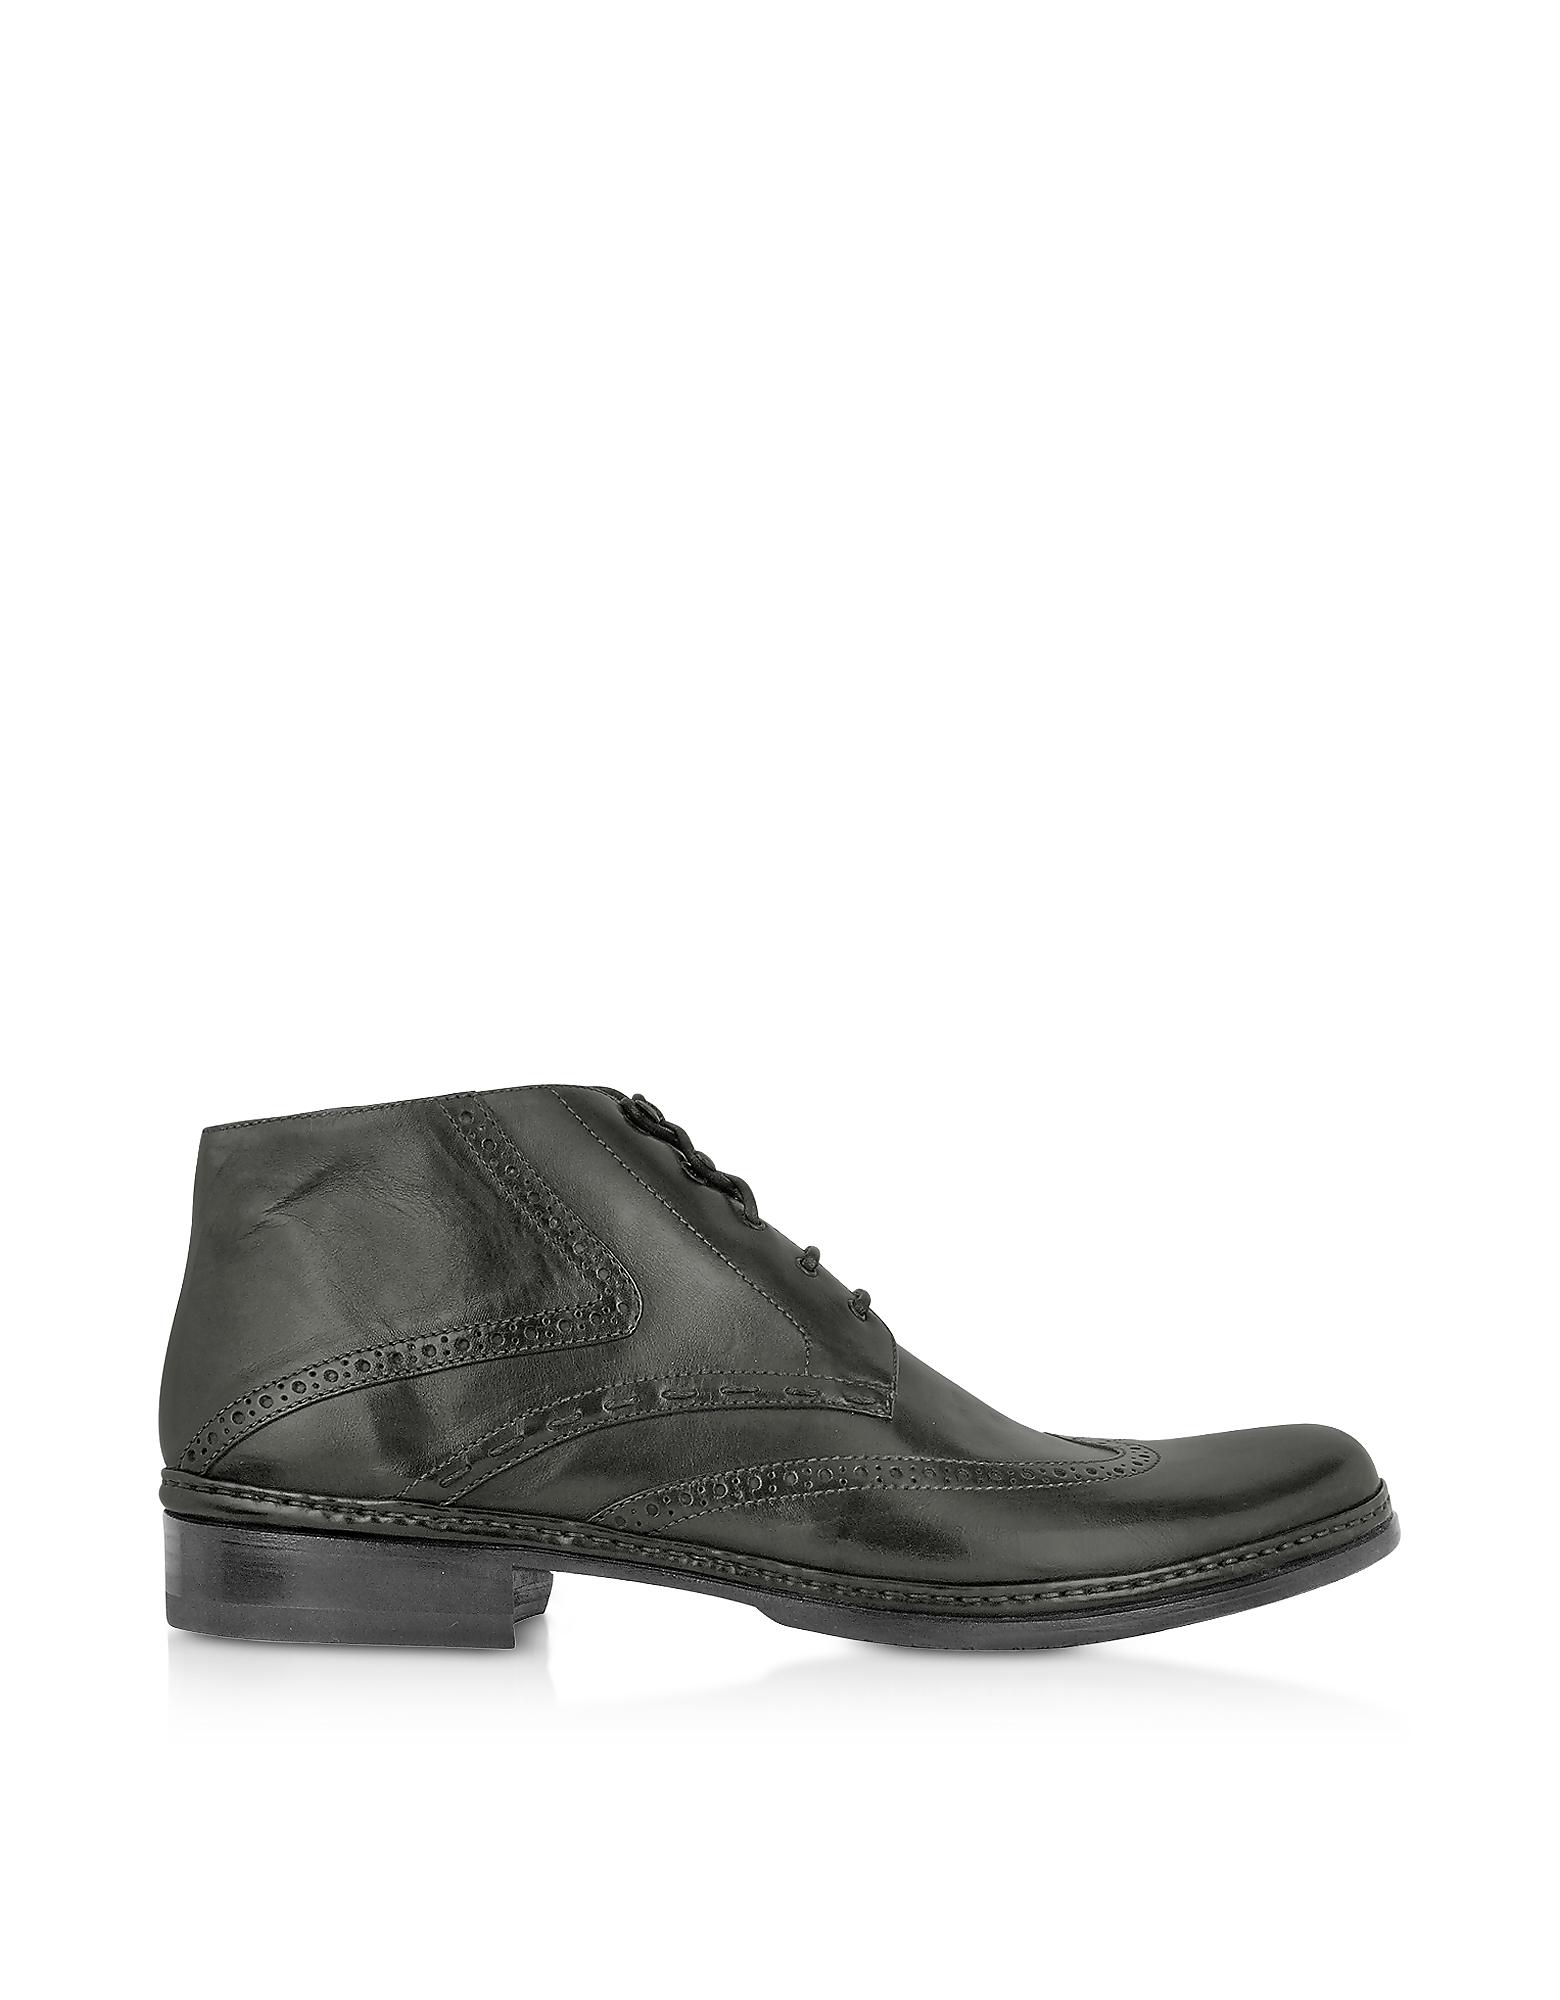 Black Handmade Italian Leather Wingtip Ankle Boots